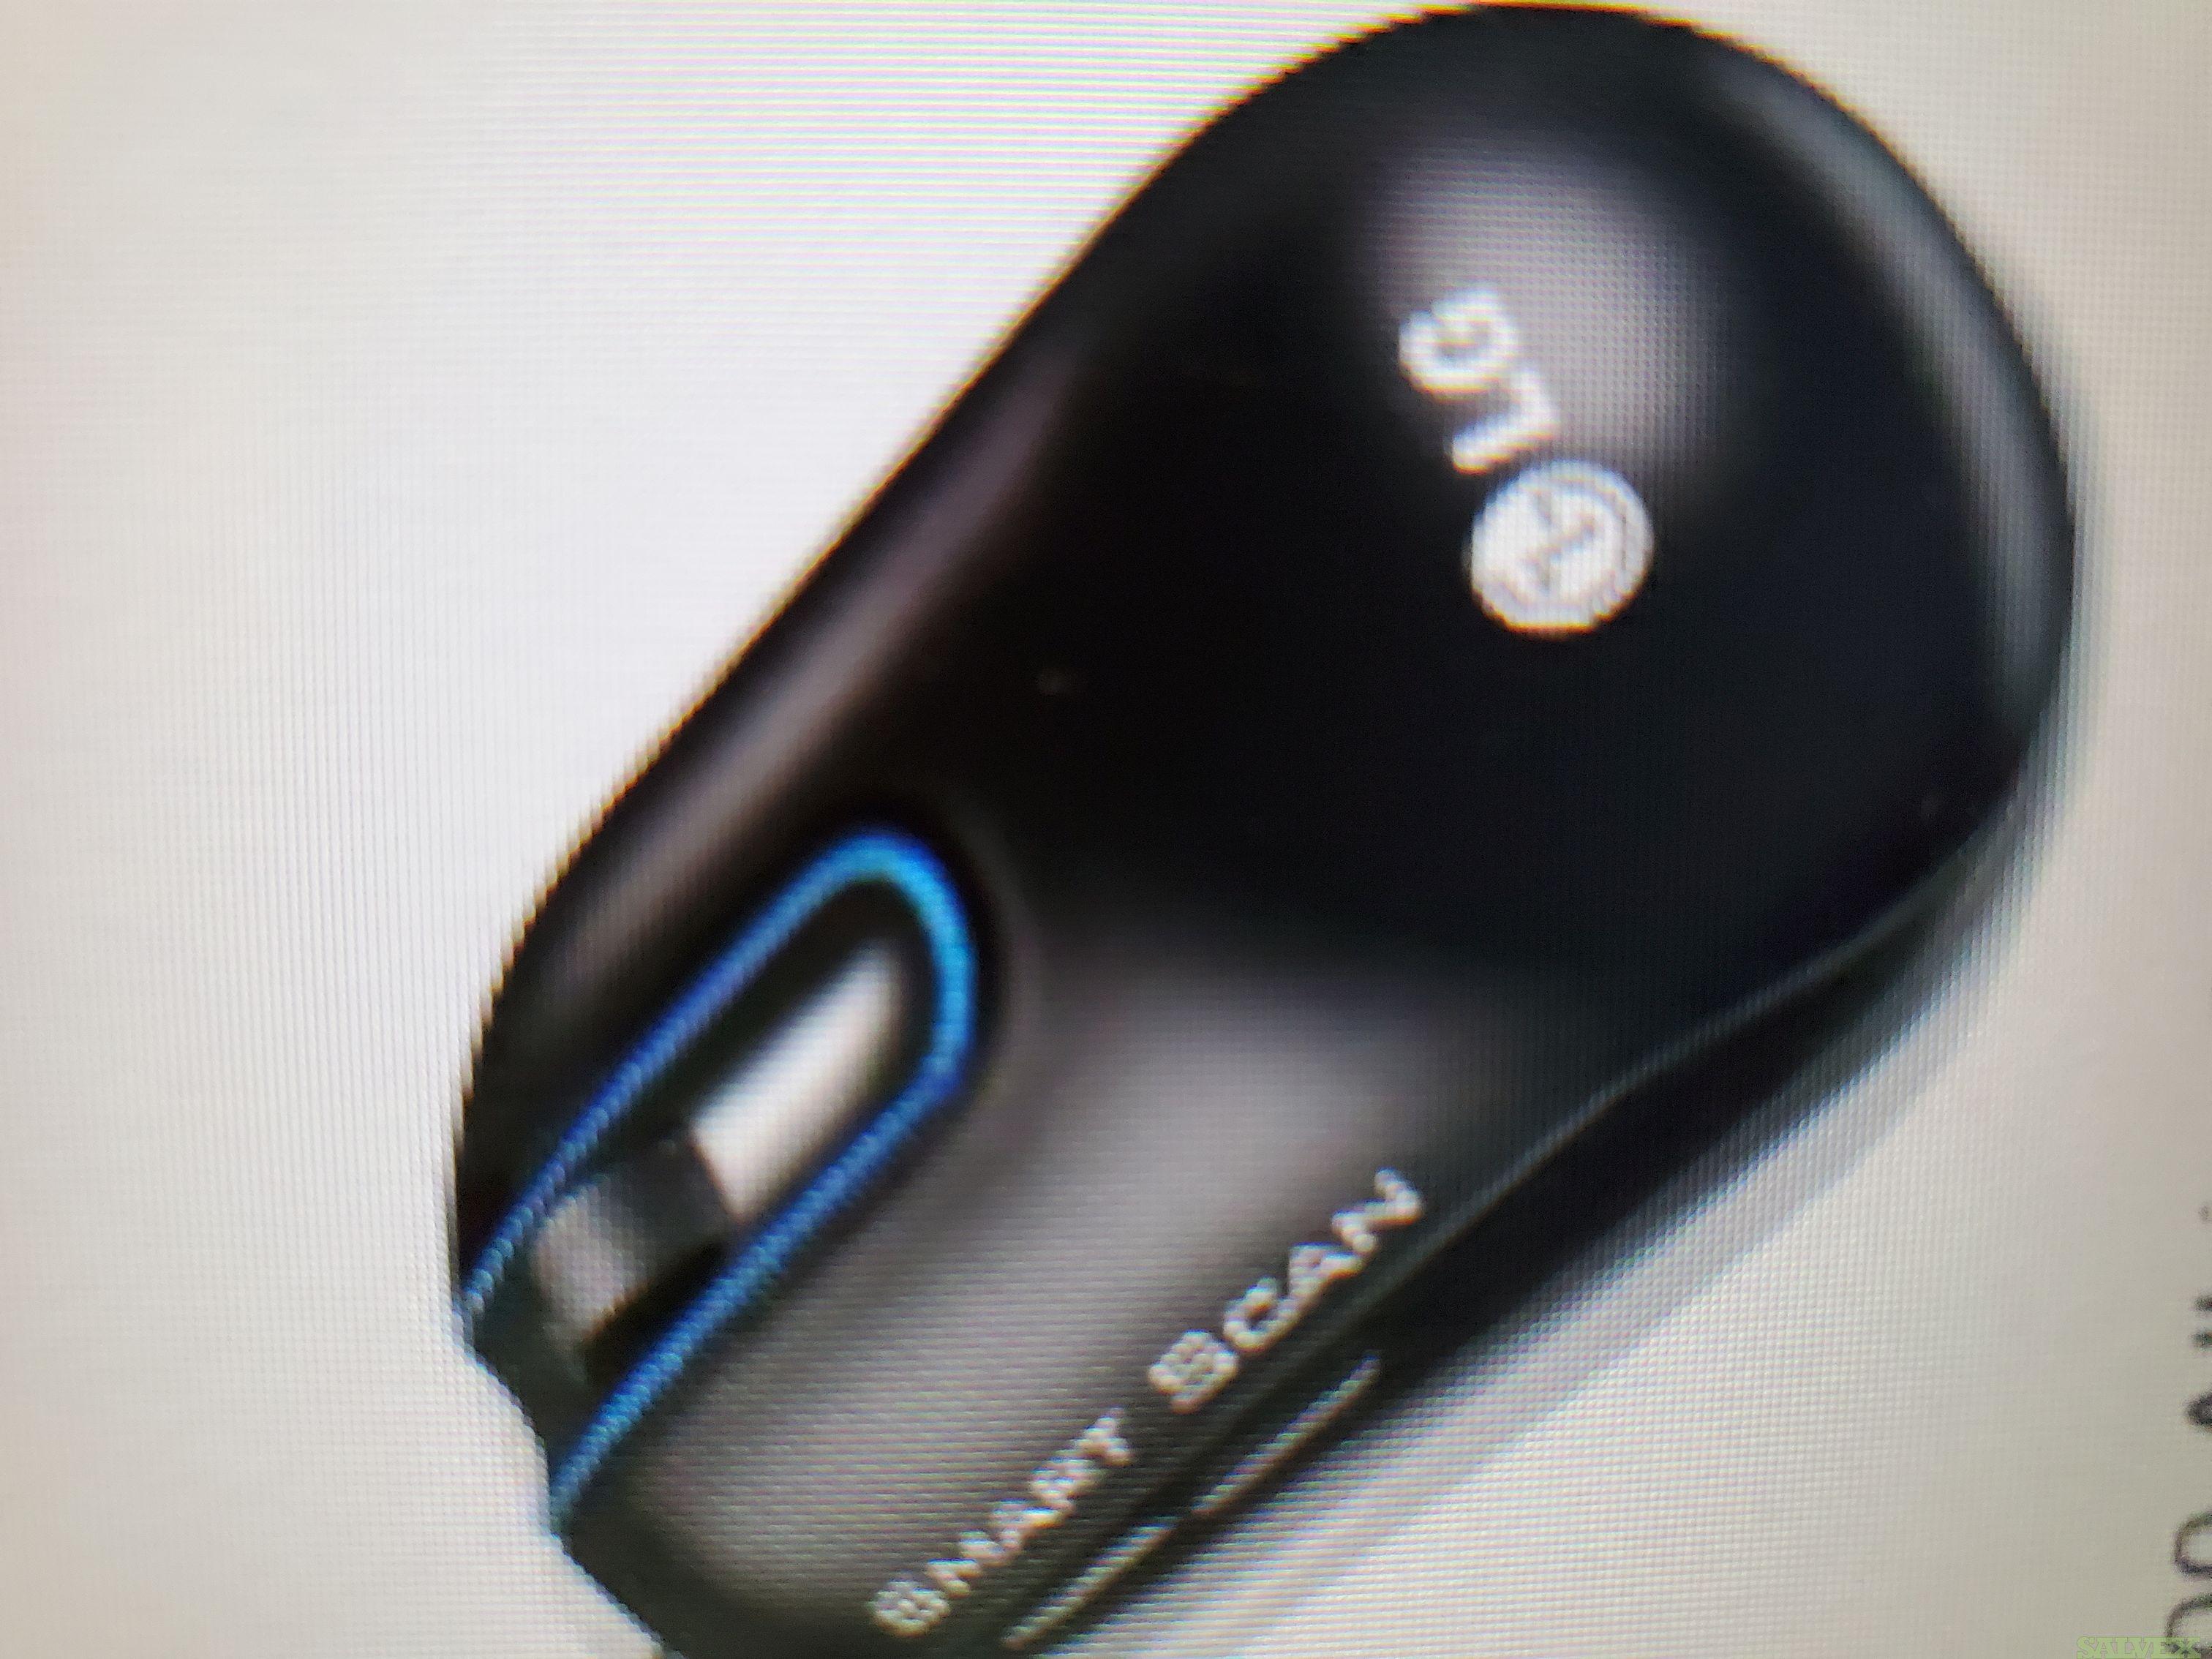 LG LSM100 Mouse Scanner (600 Pieces)